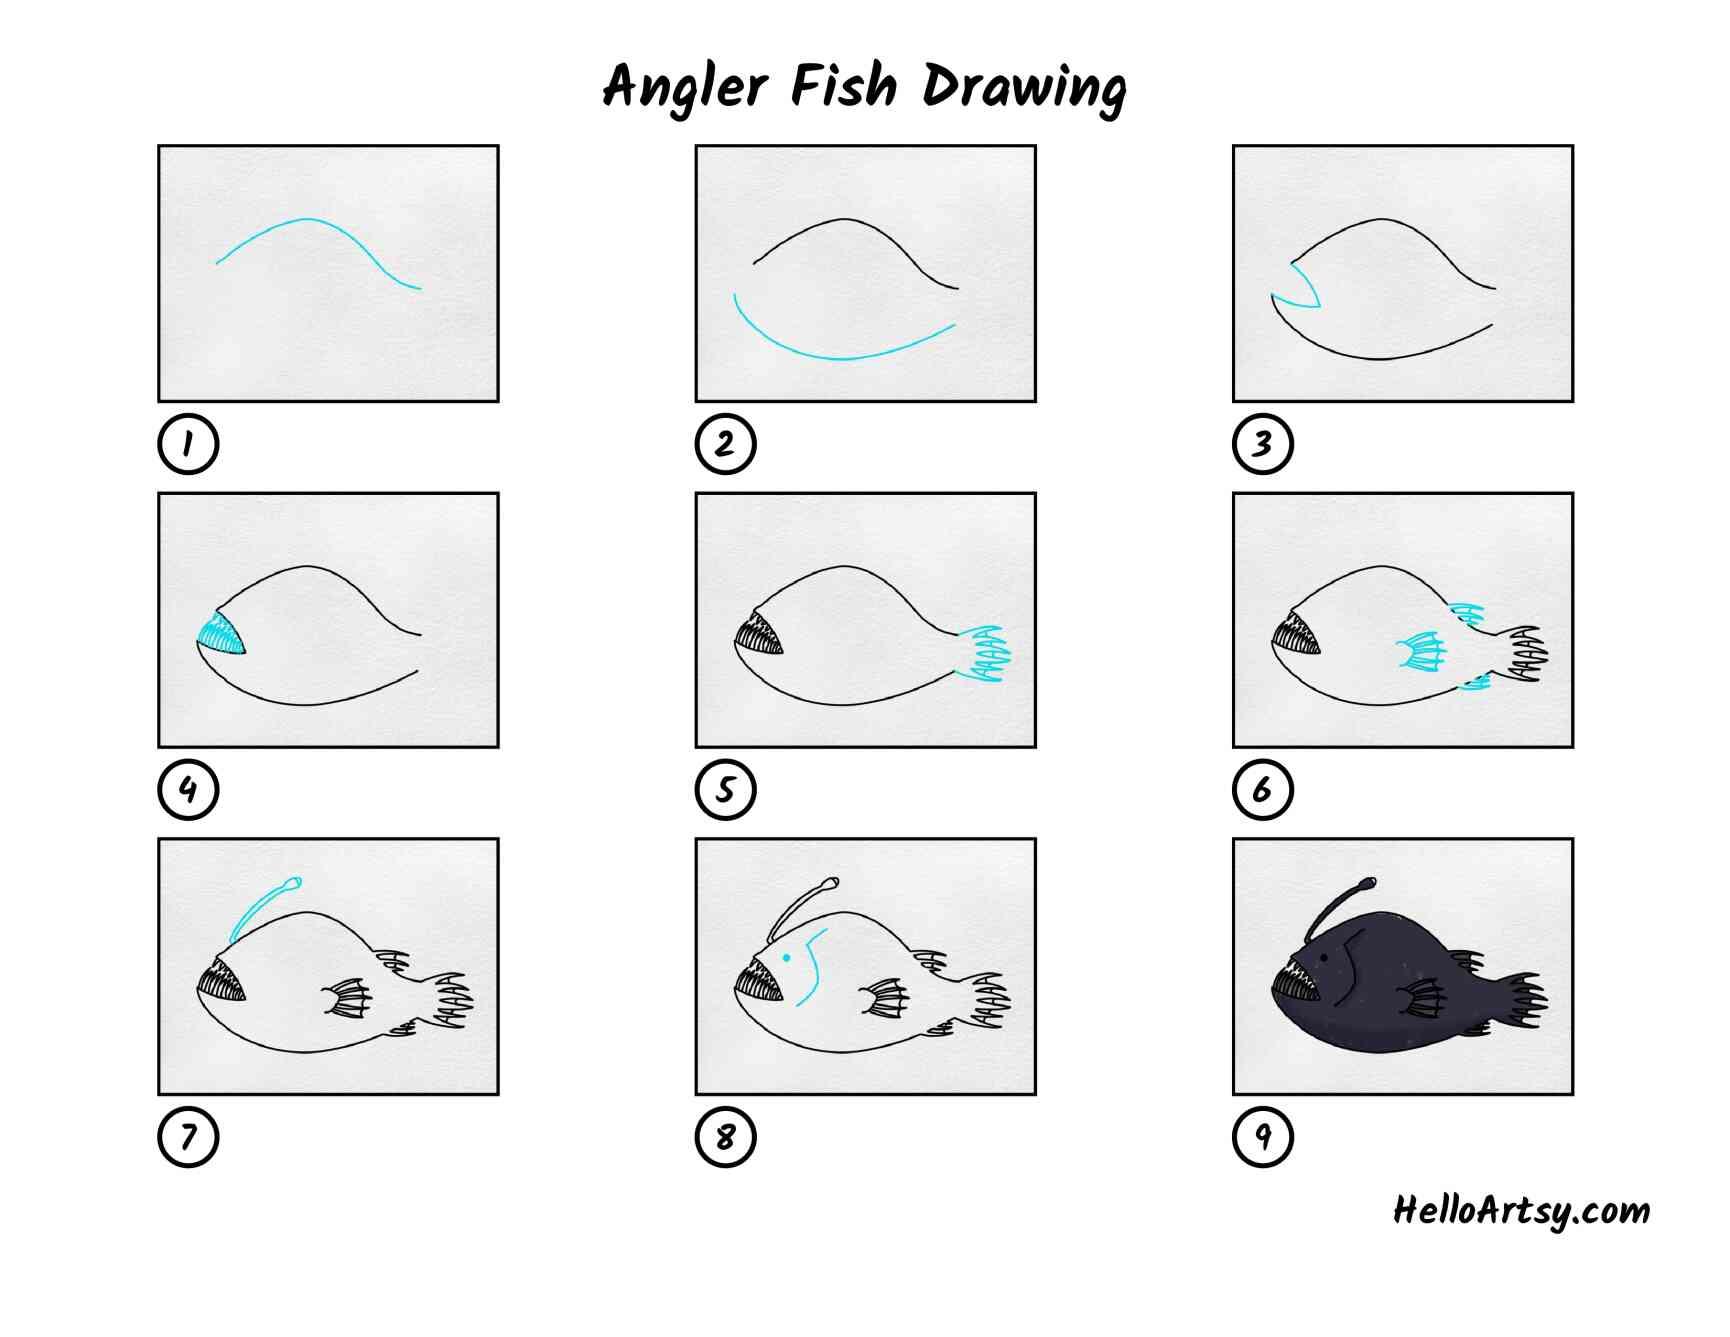 Angler Fish Drawing: All Steps